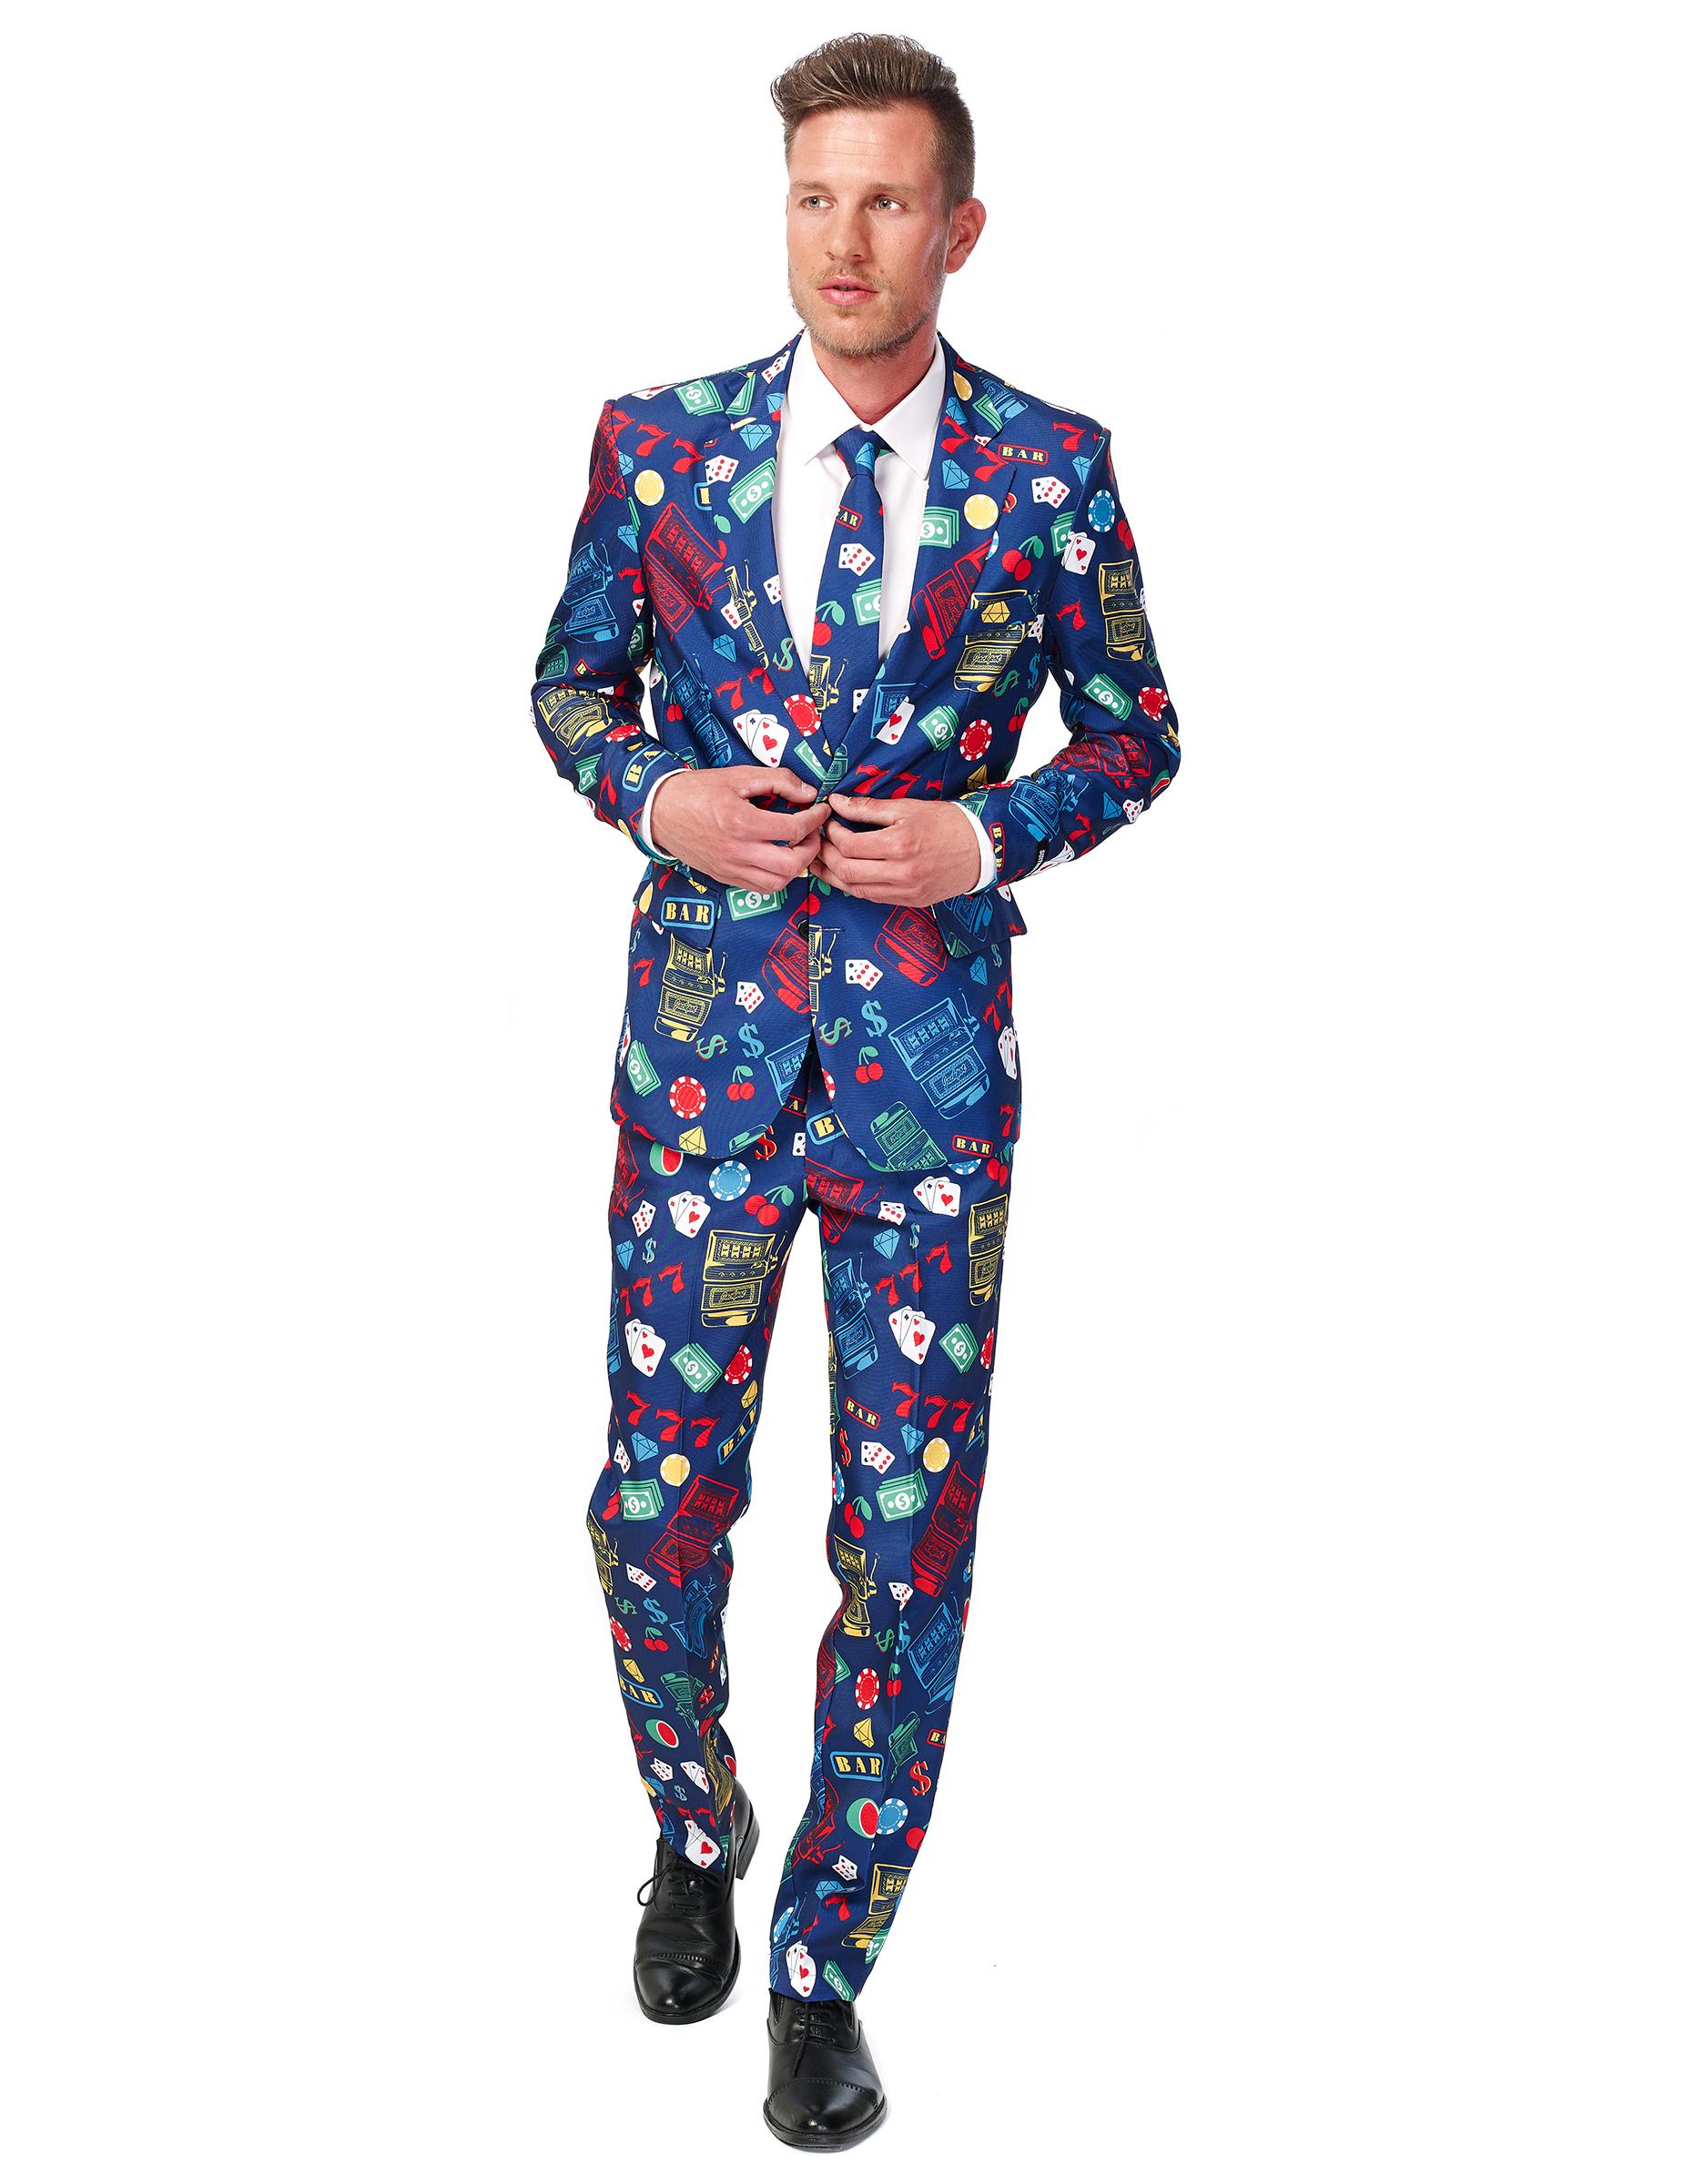 Assez Costume Mr. Casino homme Suitmeister™ : Deguise-toi, achat de  SU49